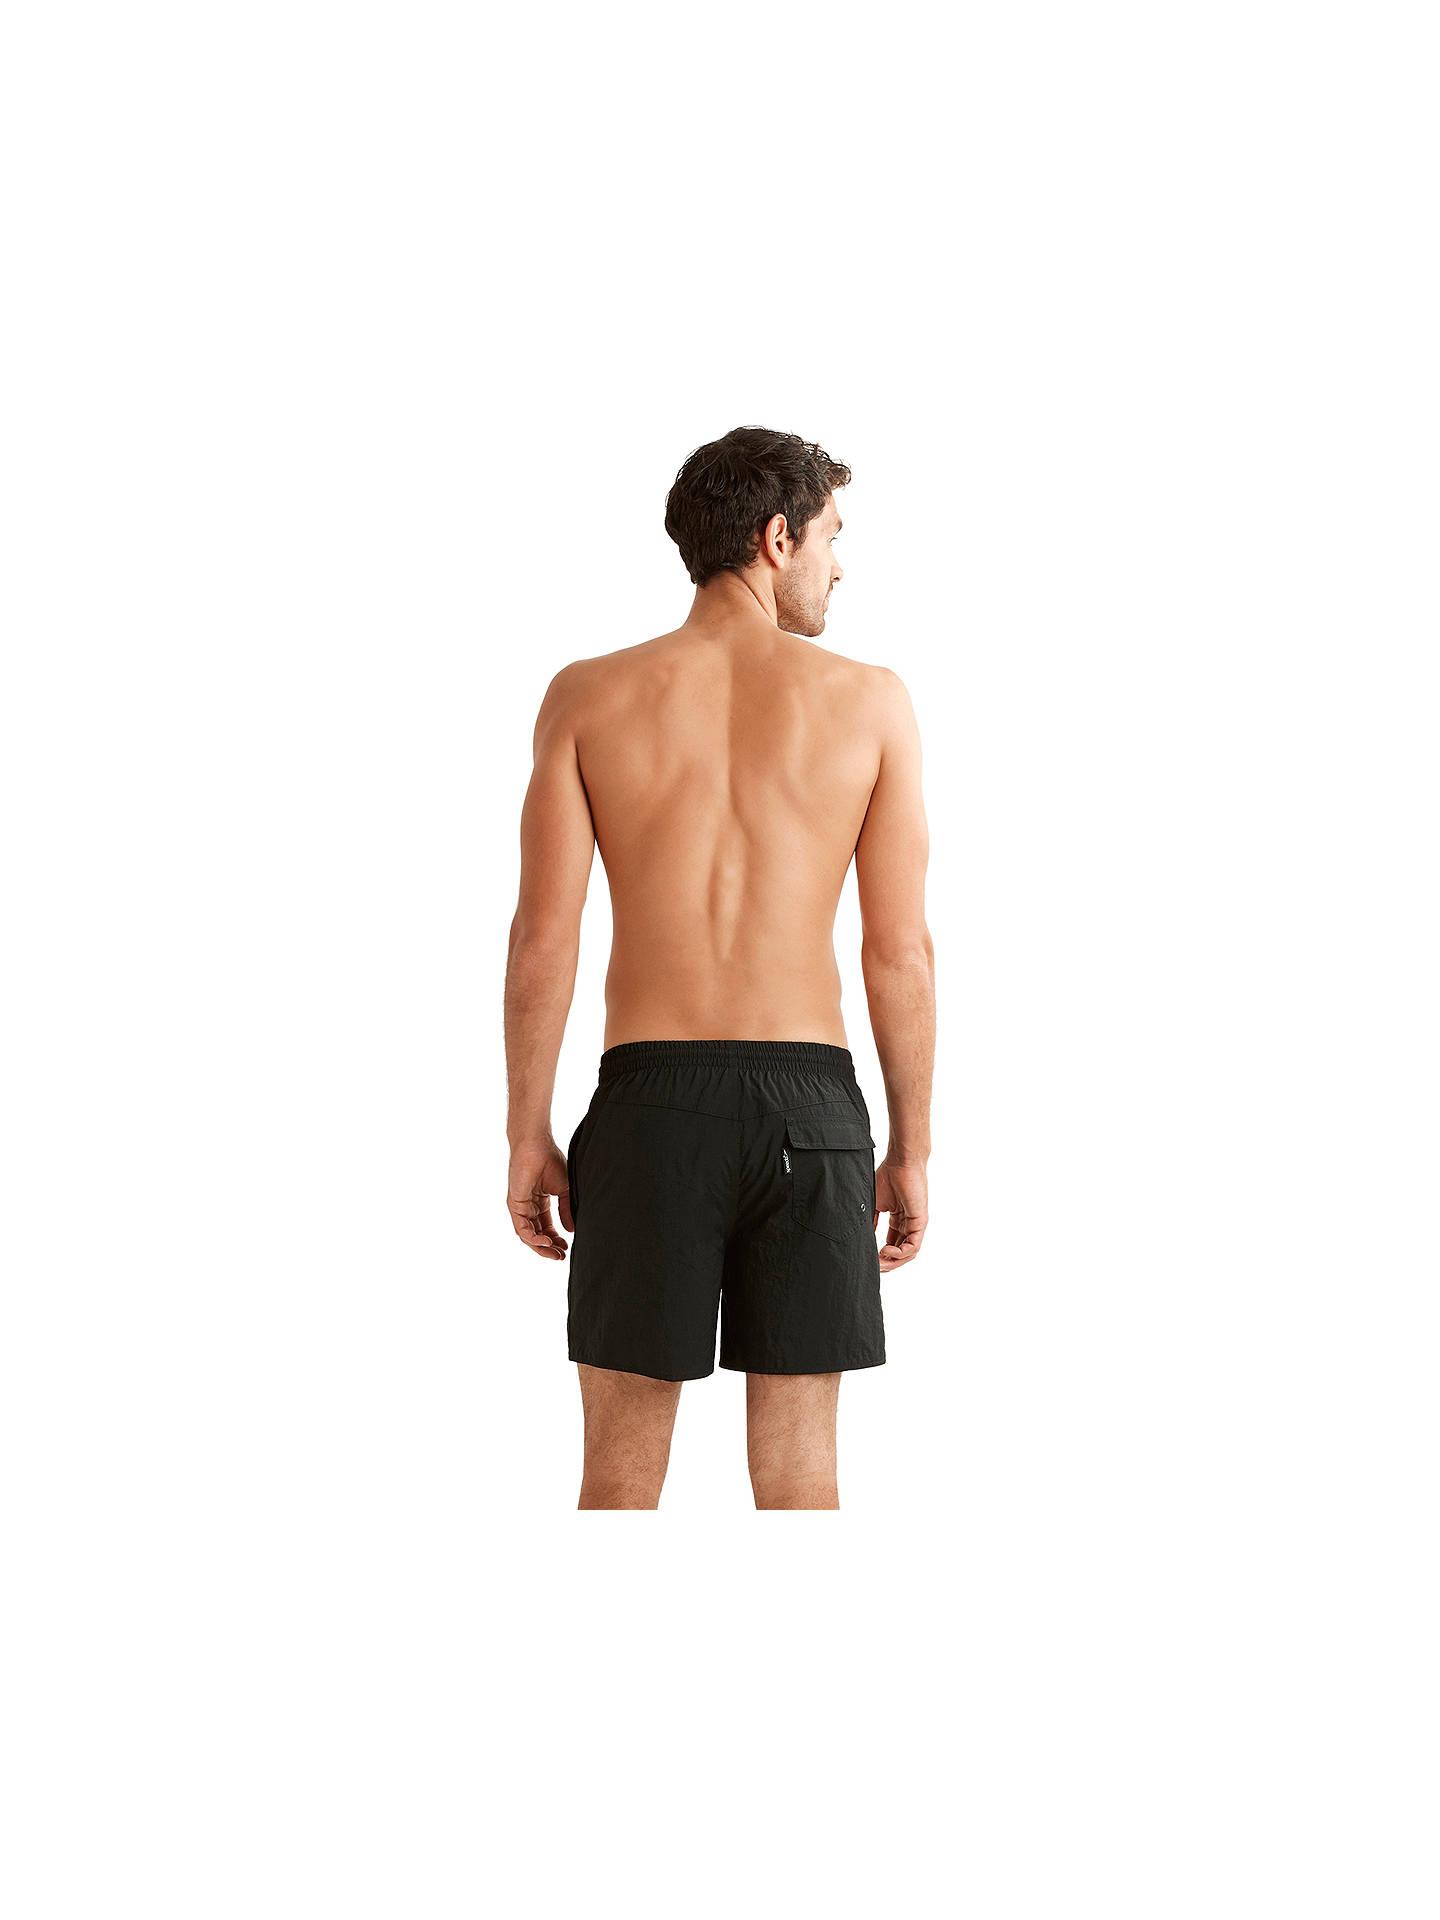 b73937472a0fd ... Buy Speedo Solid Watershort Swim Shorts, Black, M Online at  johnlewis.com ...